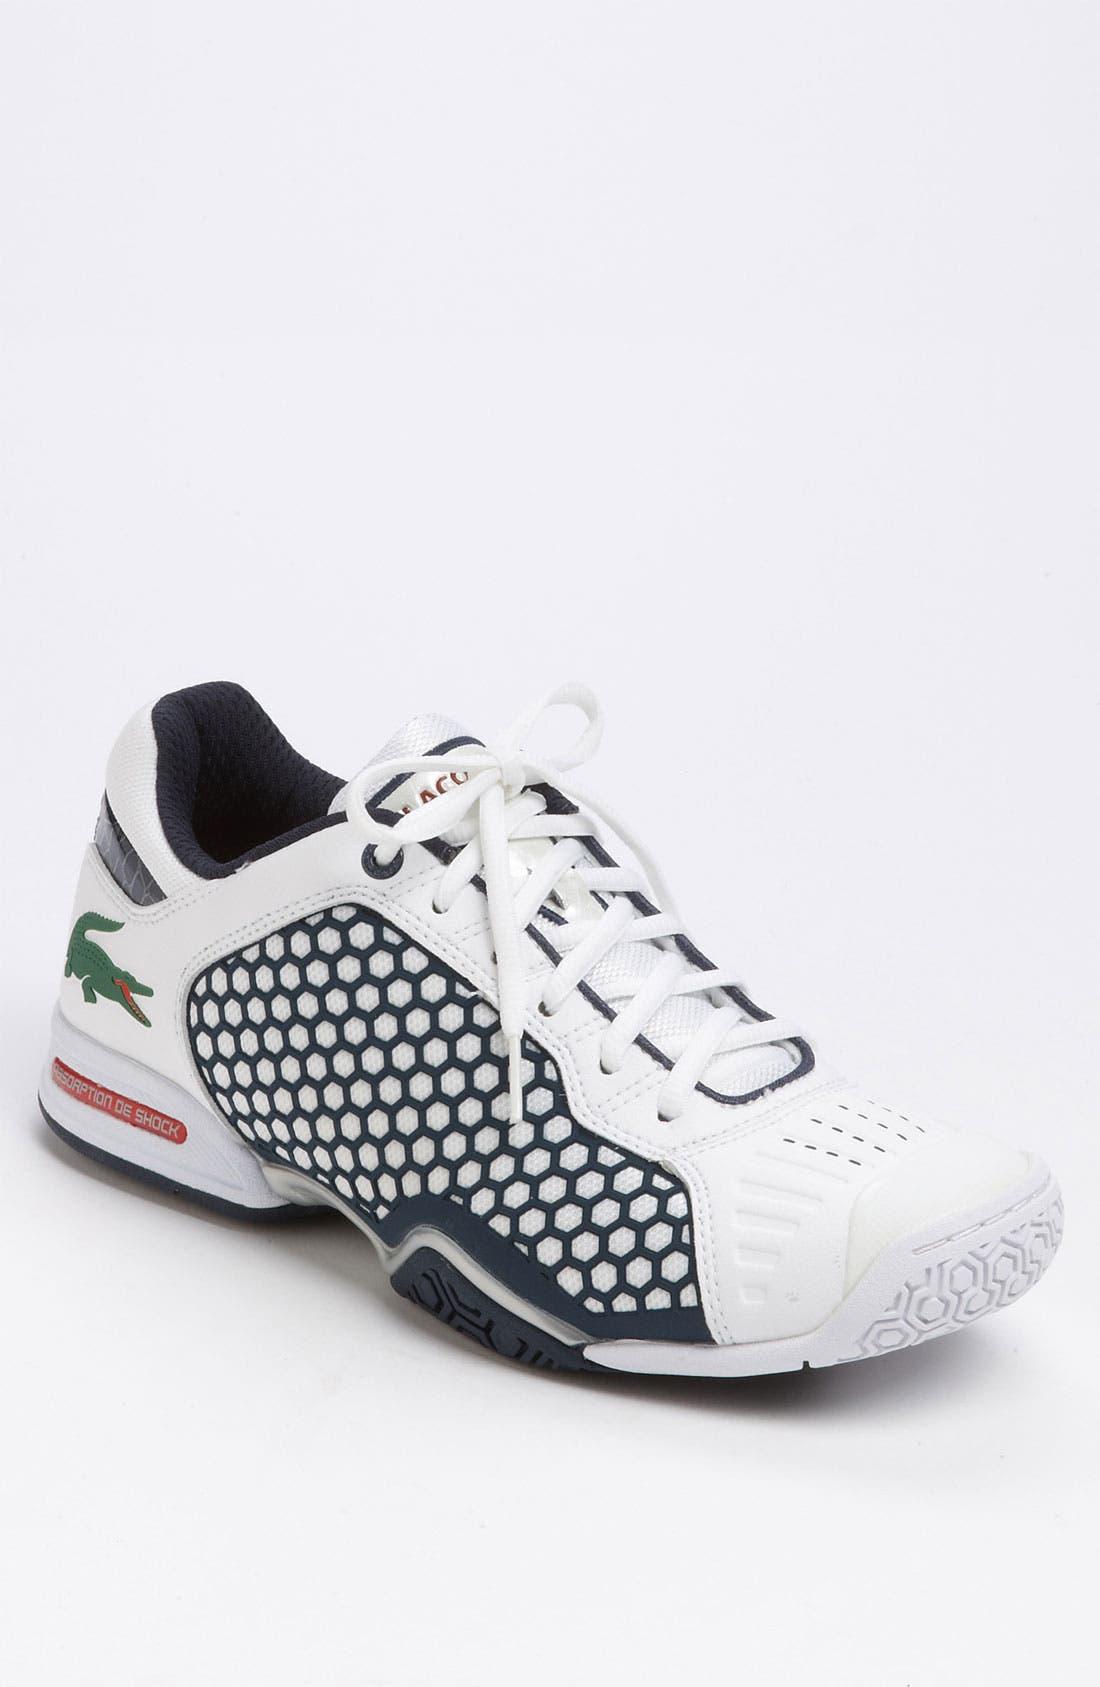 Alternate Image 1 Selected - Lacoste 'Repel' Tennis Shoe (Men)